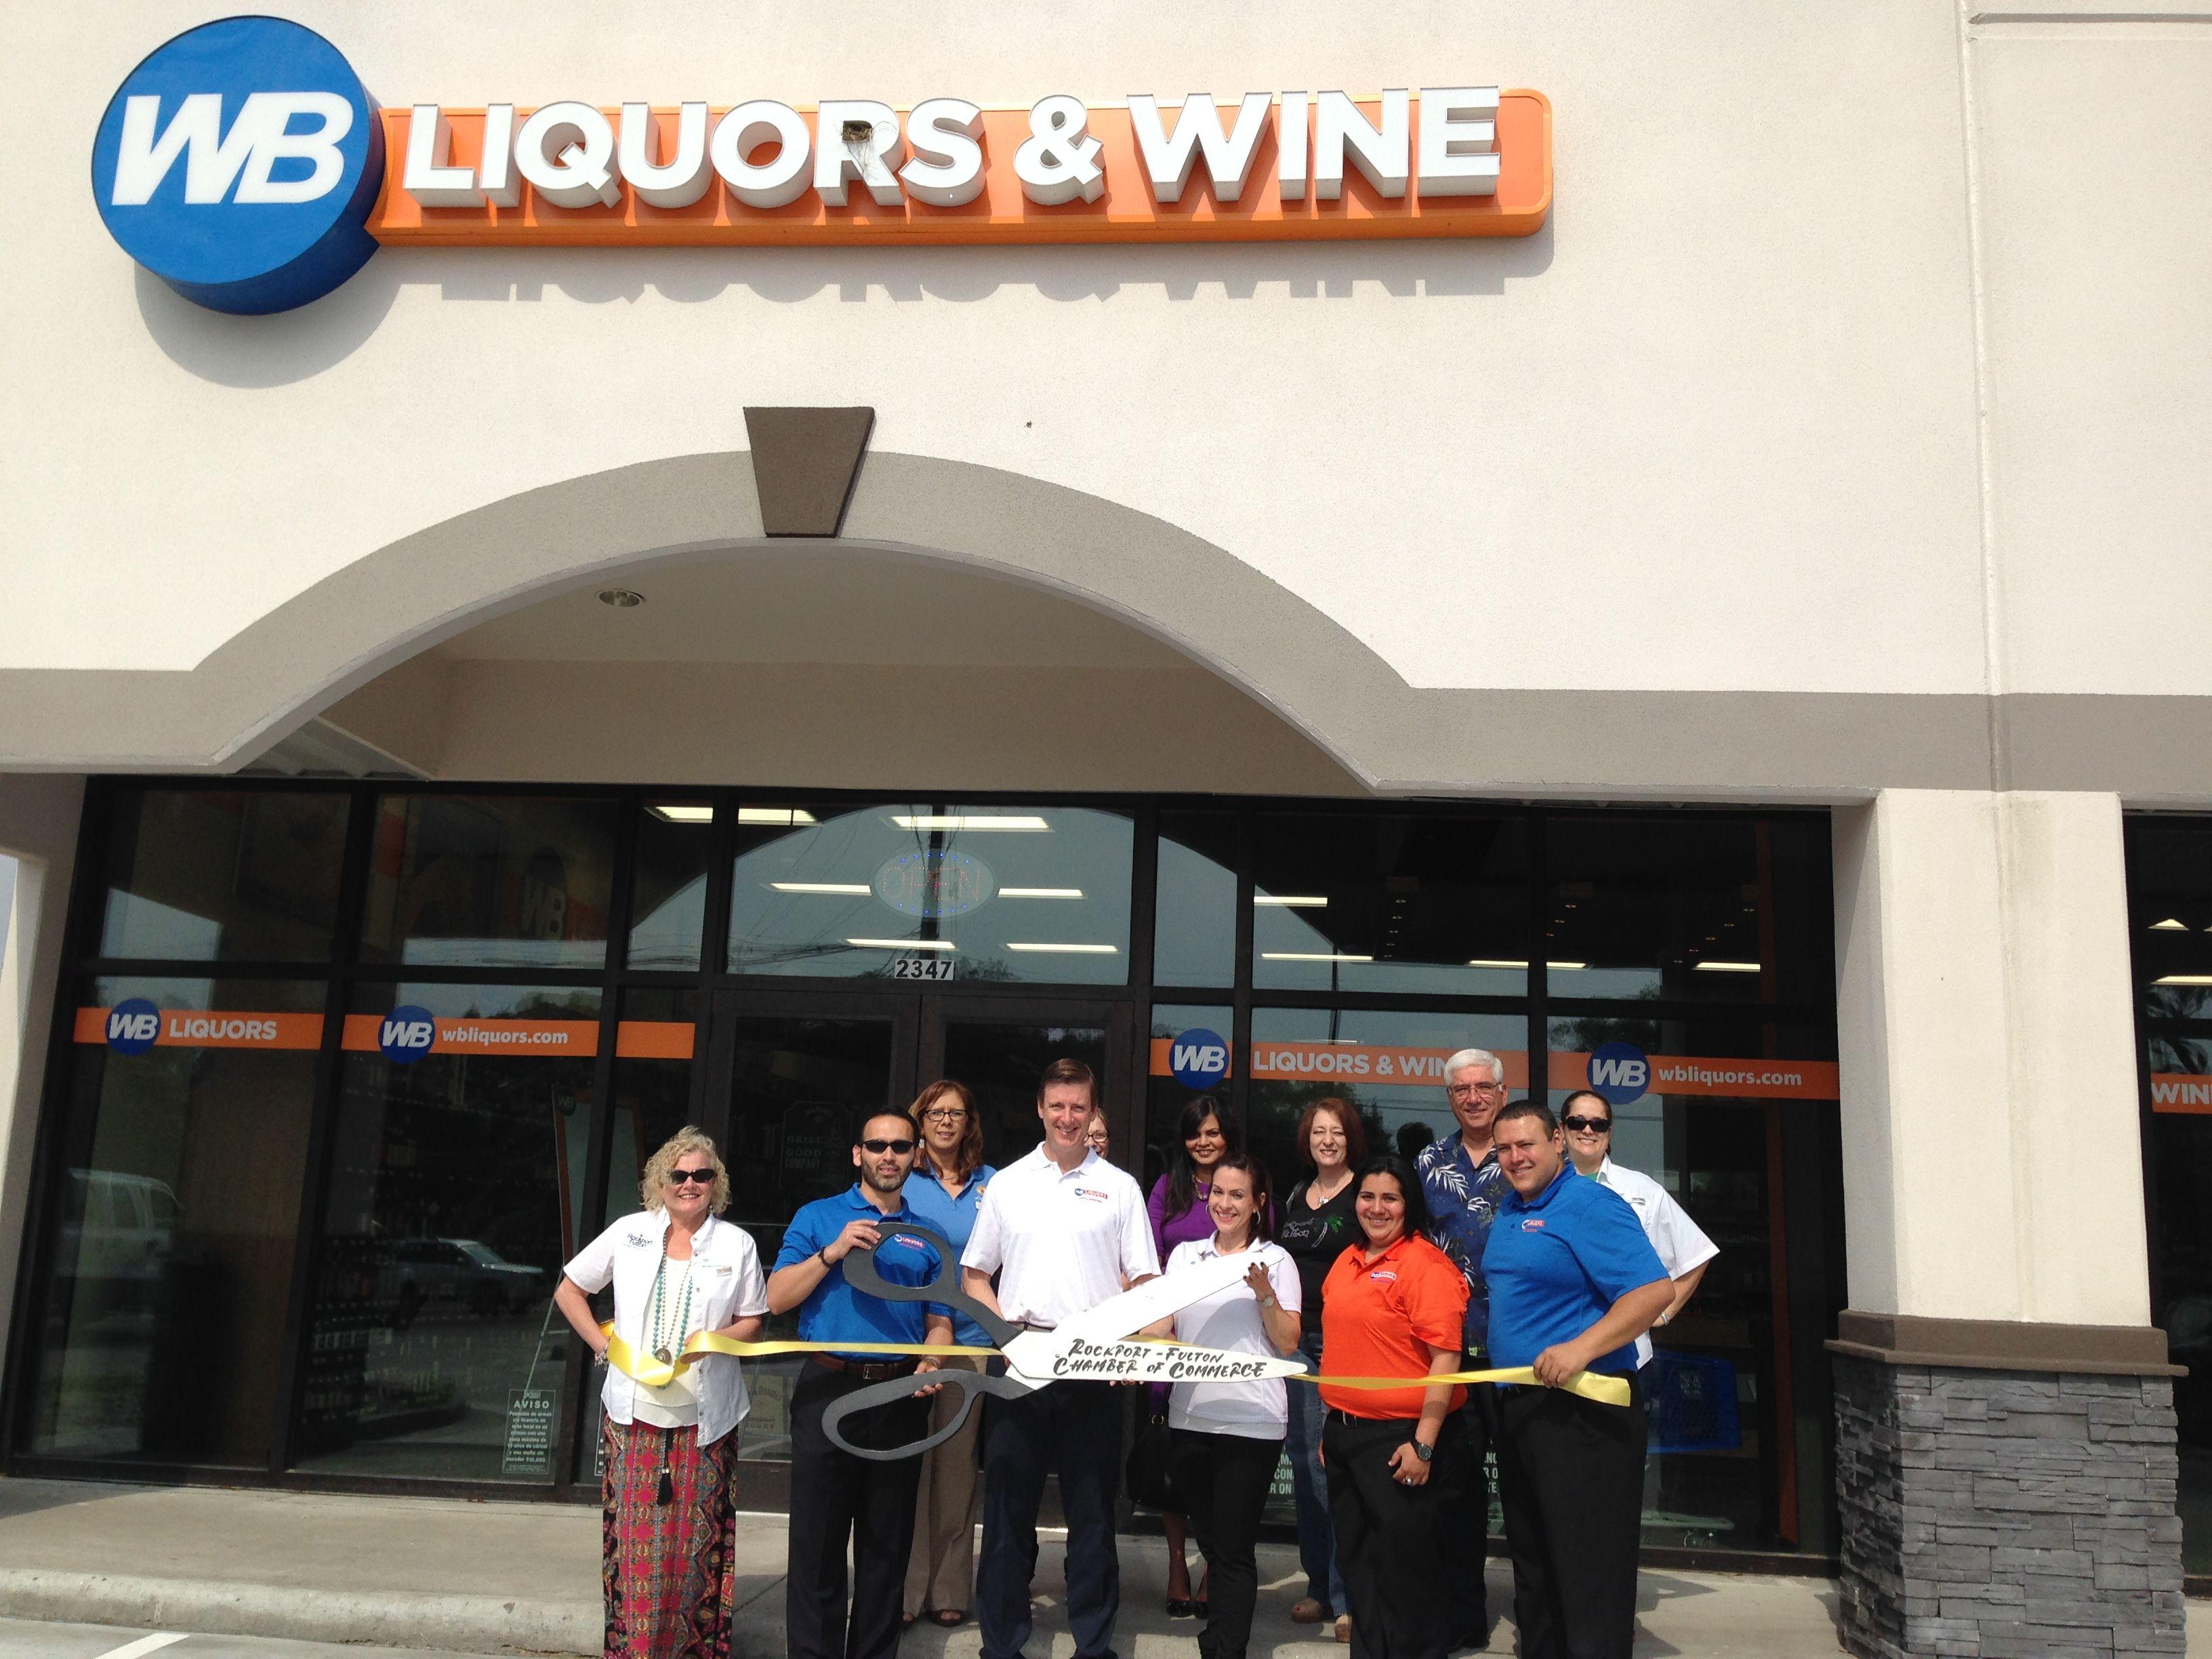 Plexus Chamber Of Commerce: WB Liquors & Wine Rockport-Fulton Texas Http://wbliquors